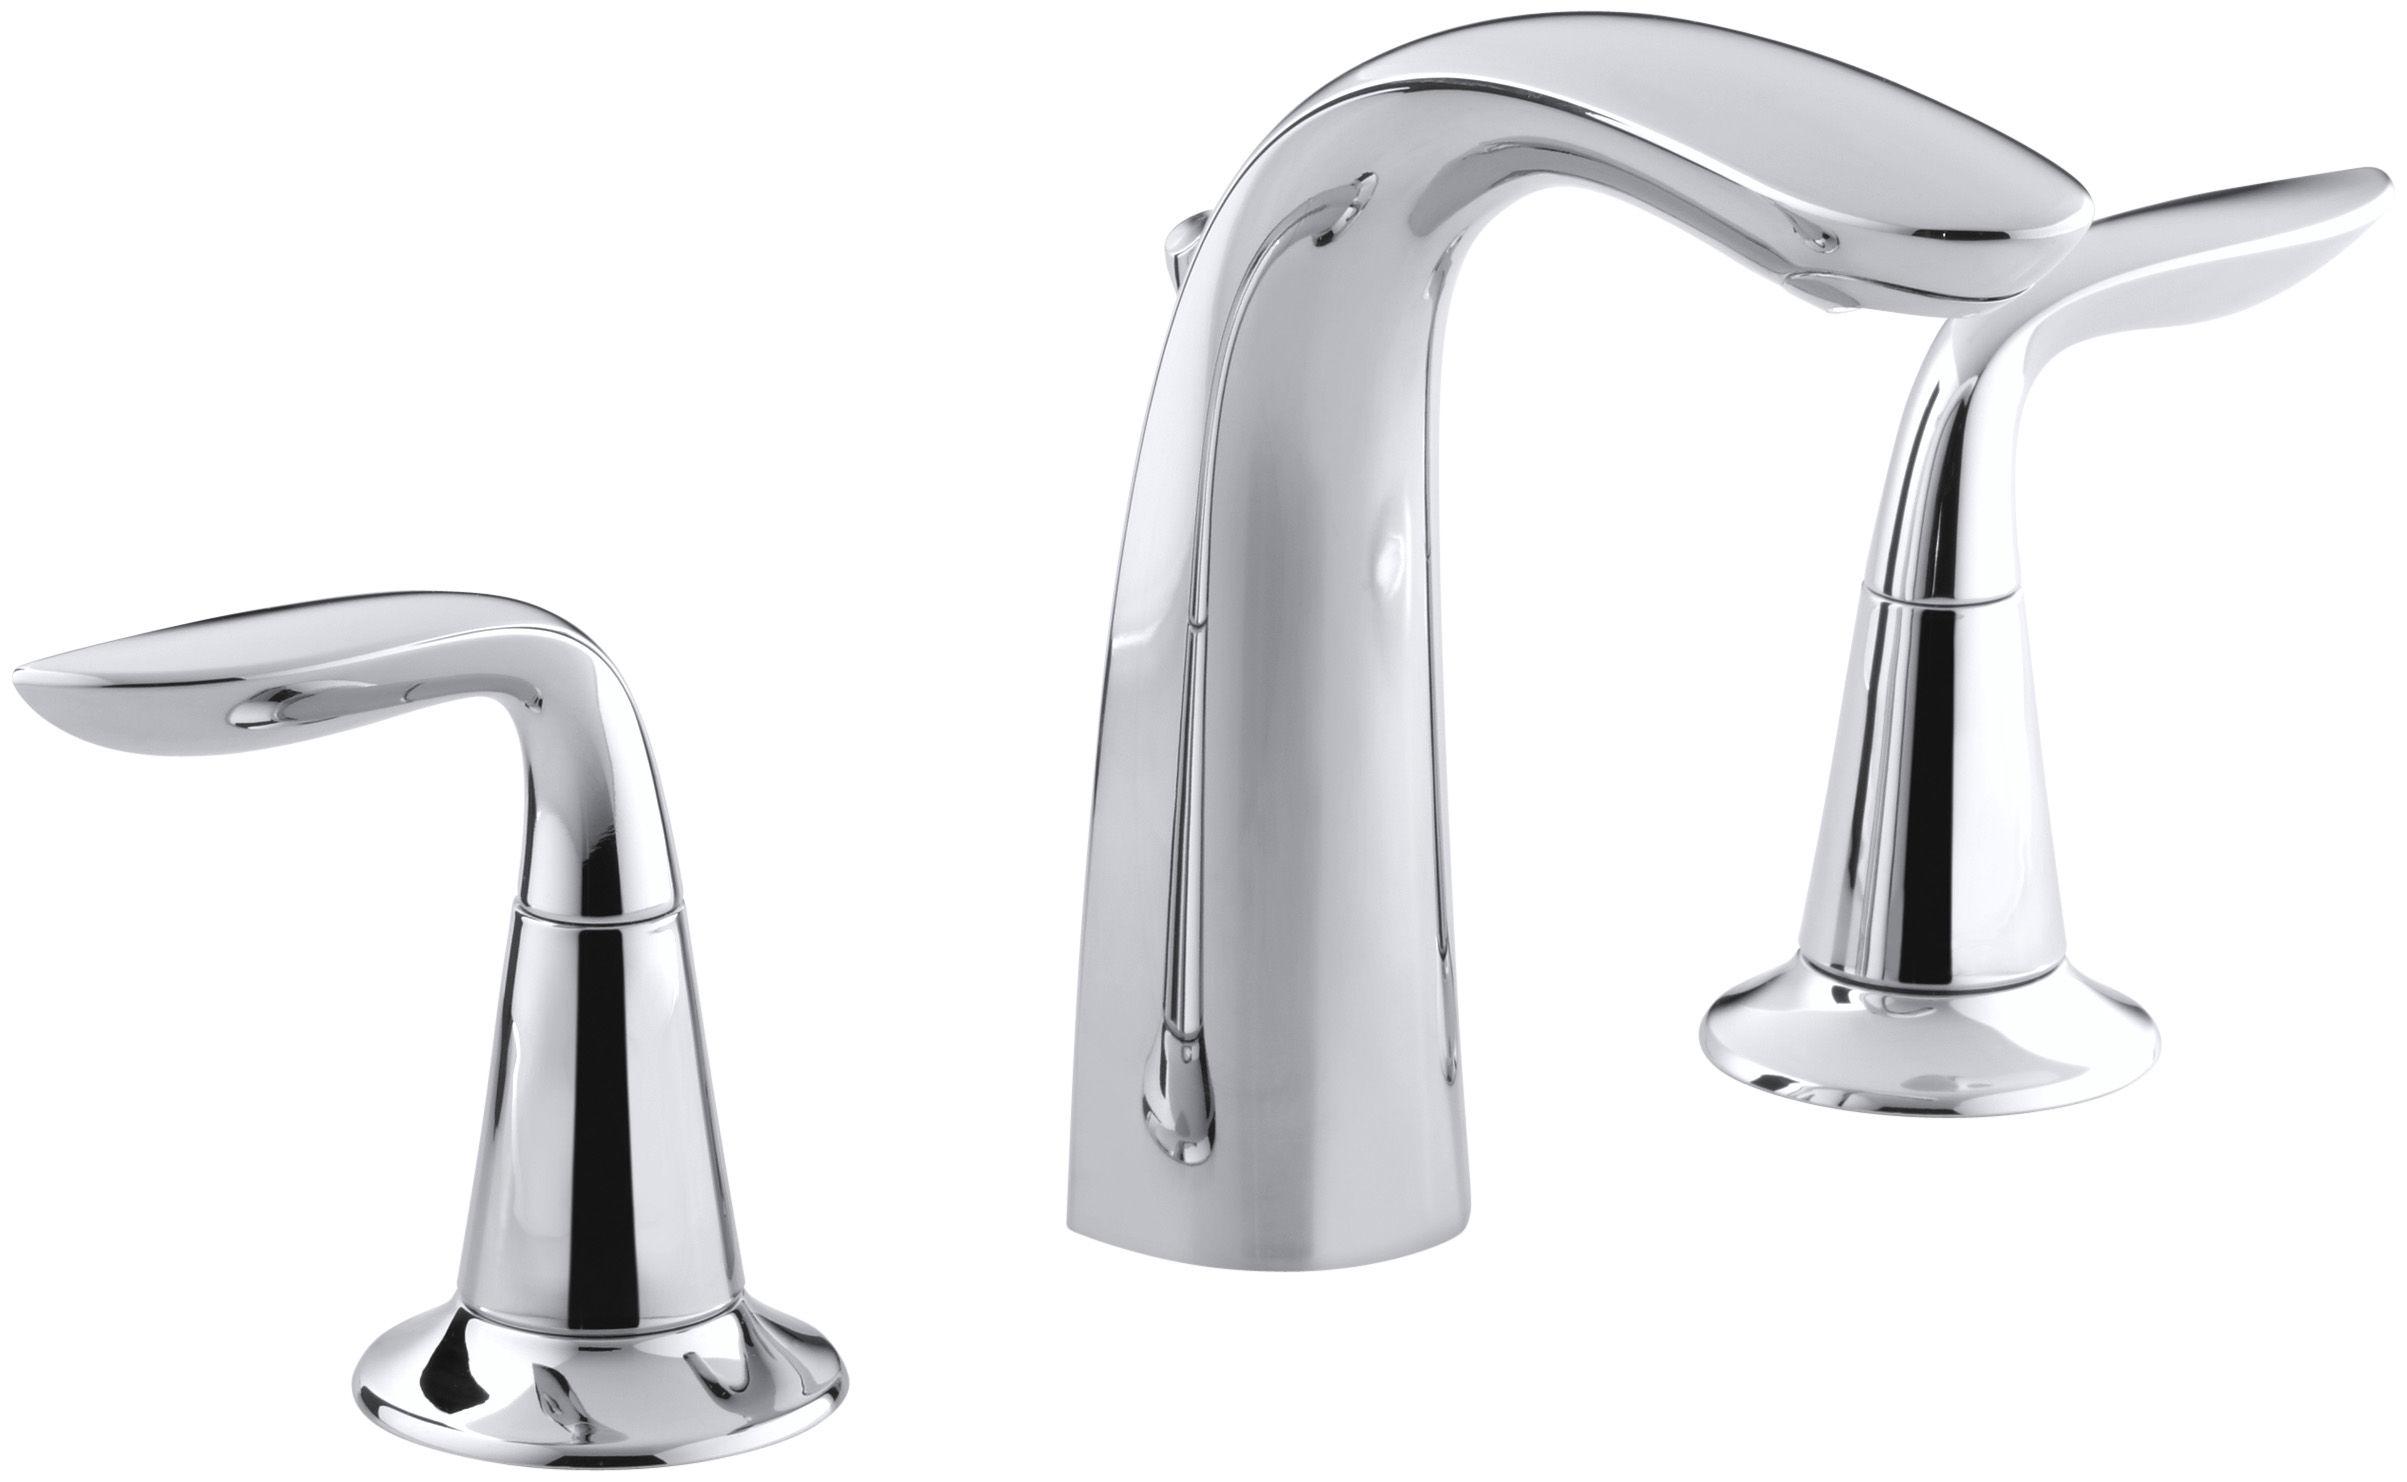 Kohler K-5317-4-CP Polished Chrome Refinia Widespread Bathroom ...